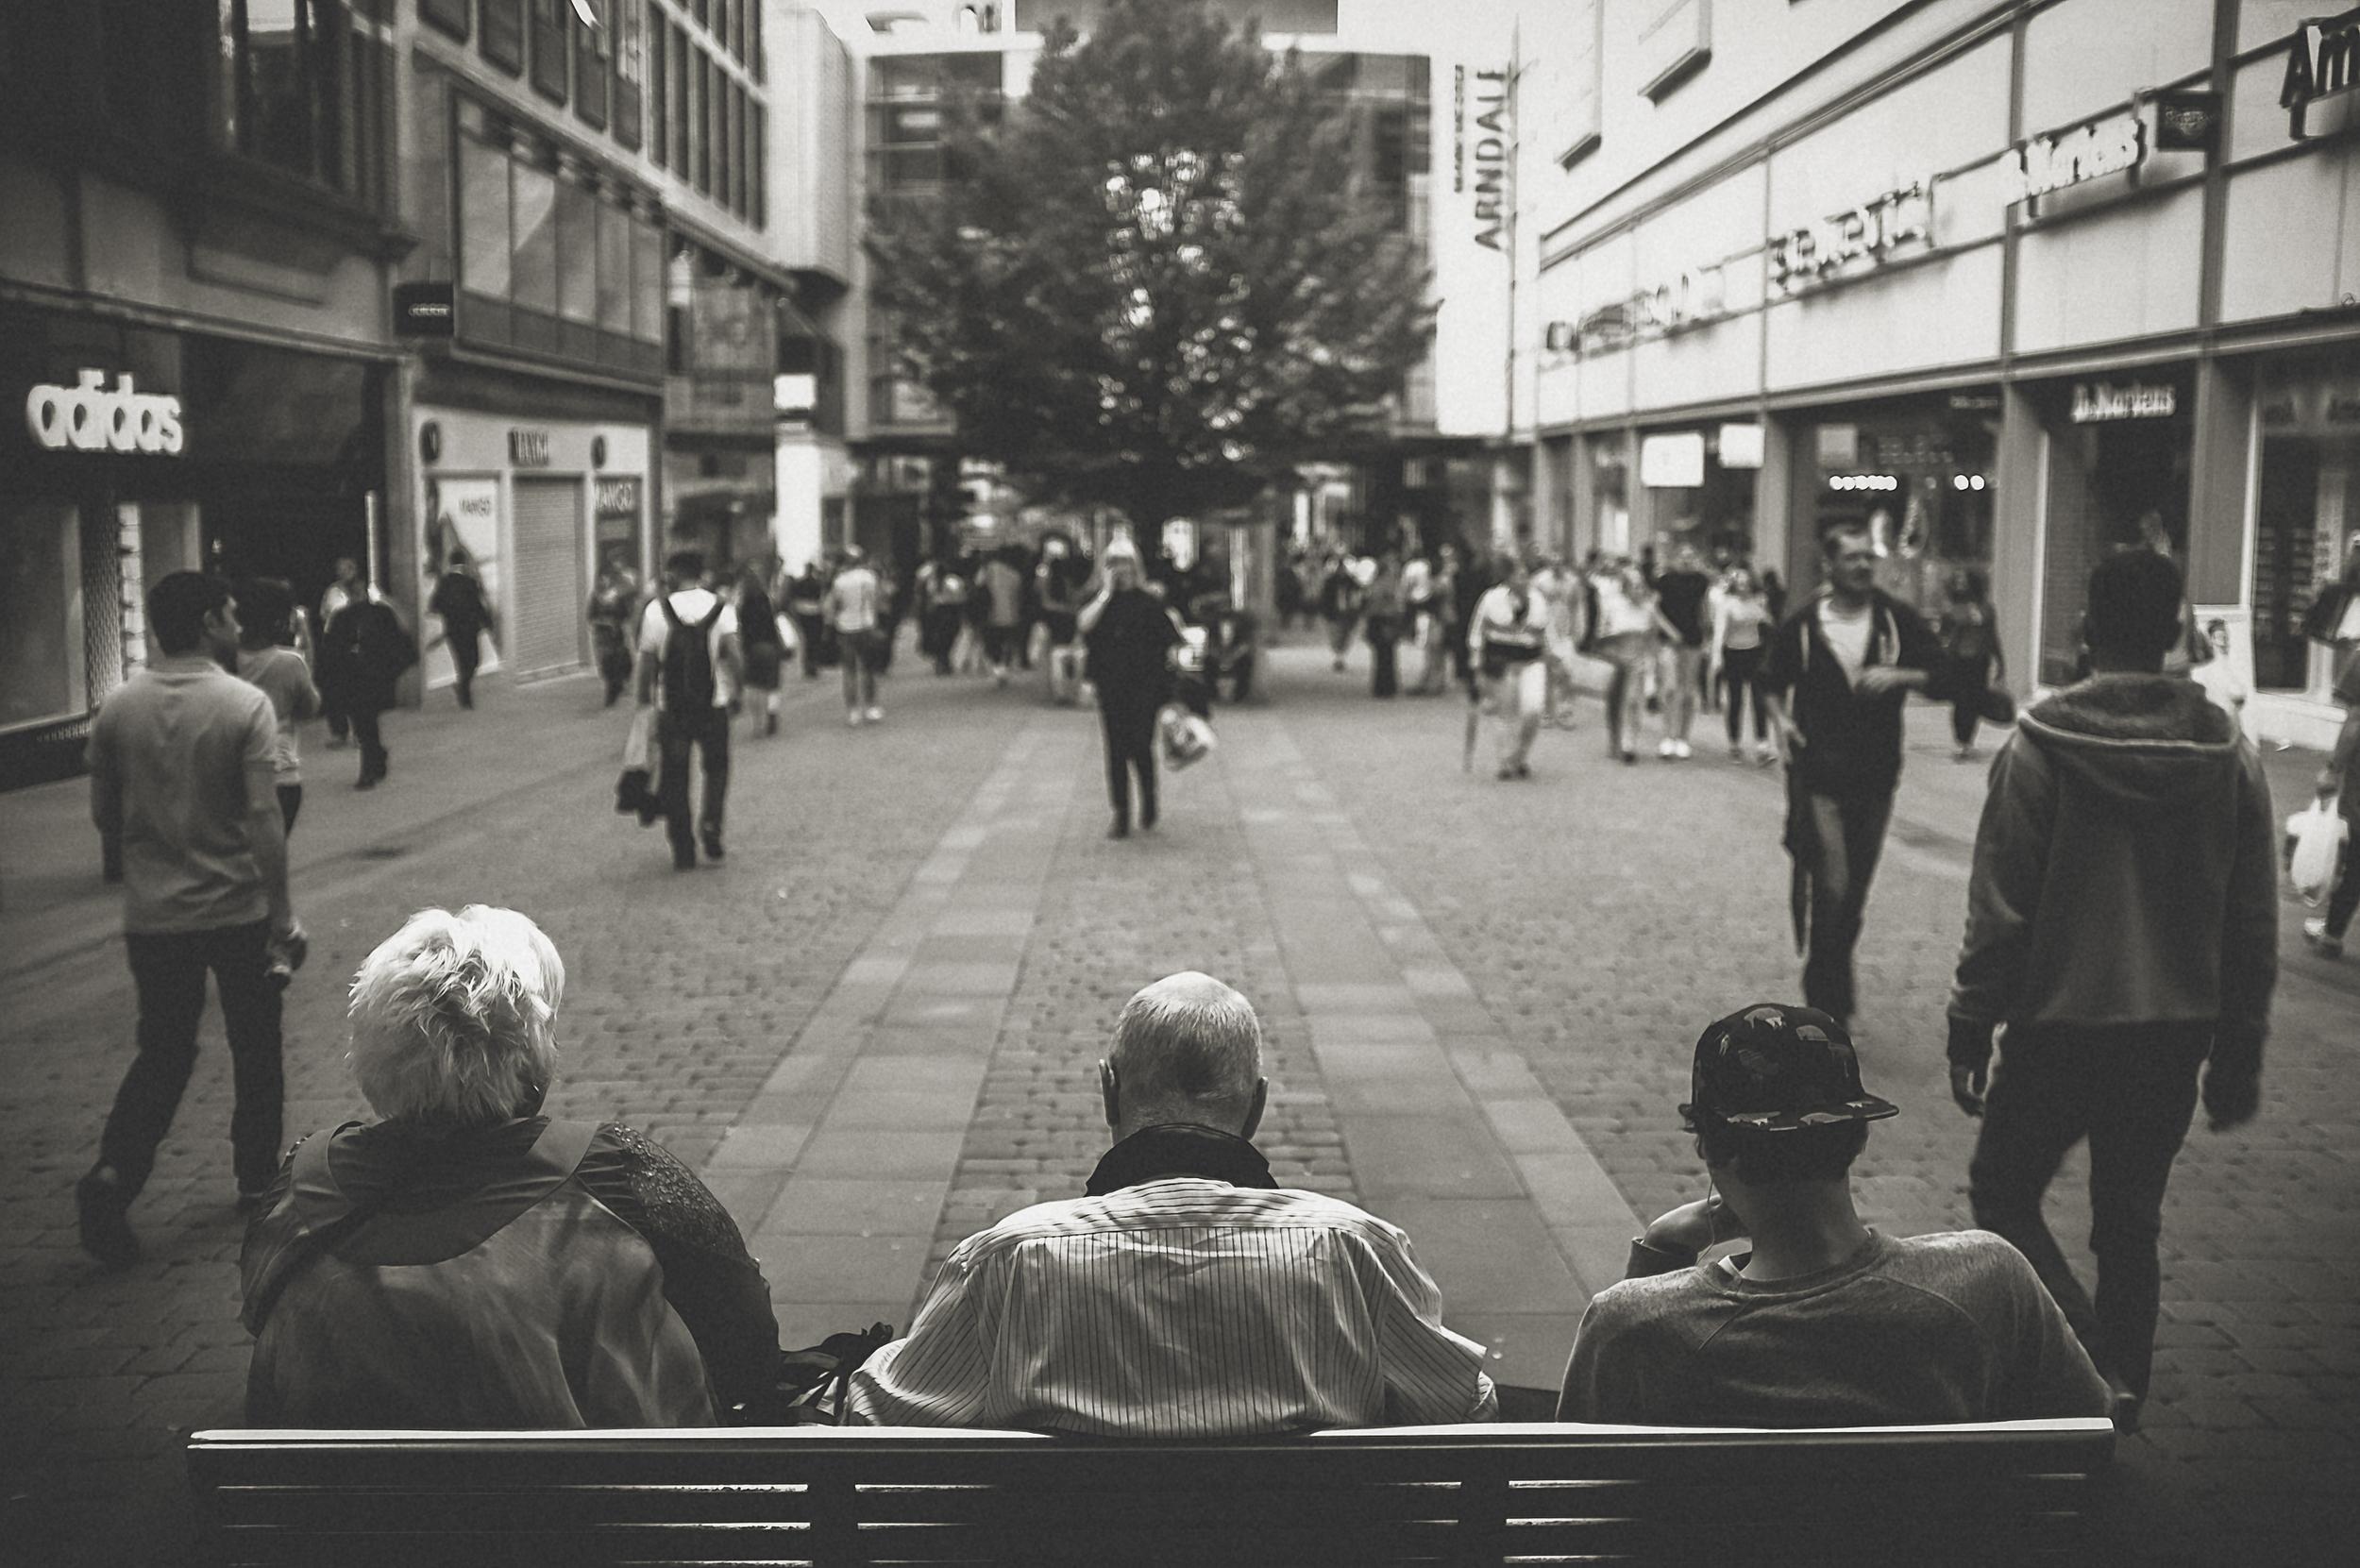 street_photography_fuji_x100-14.jpg